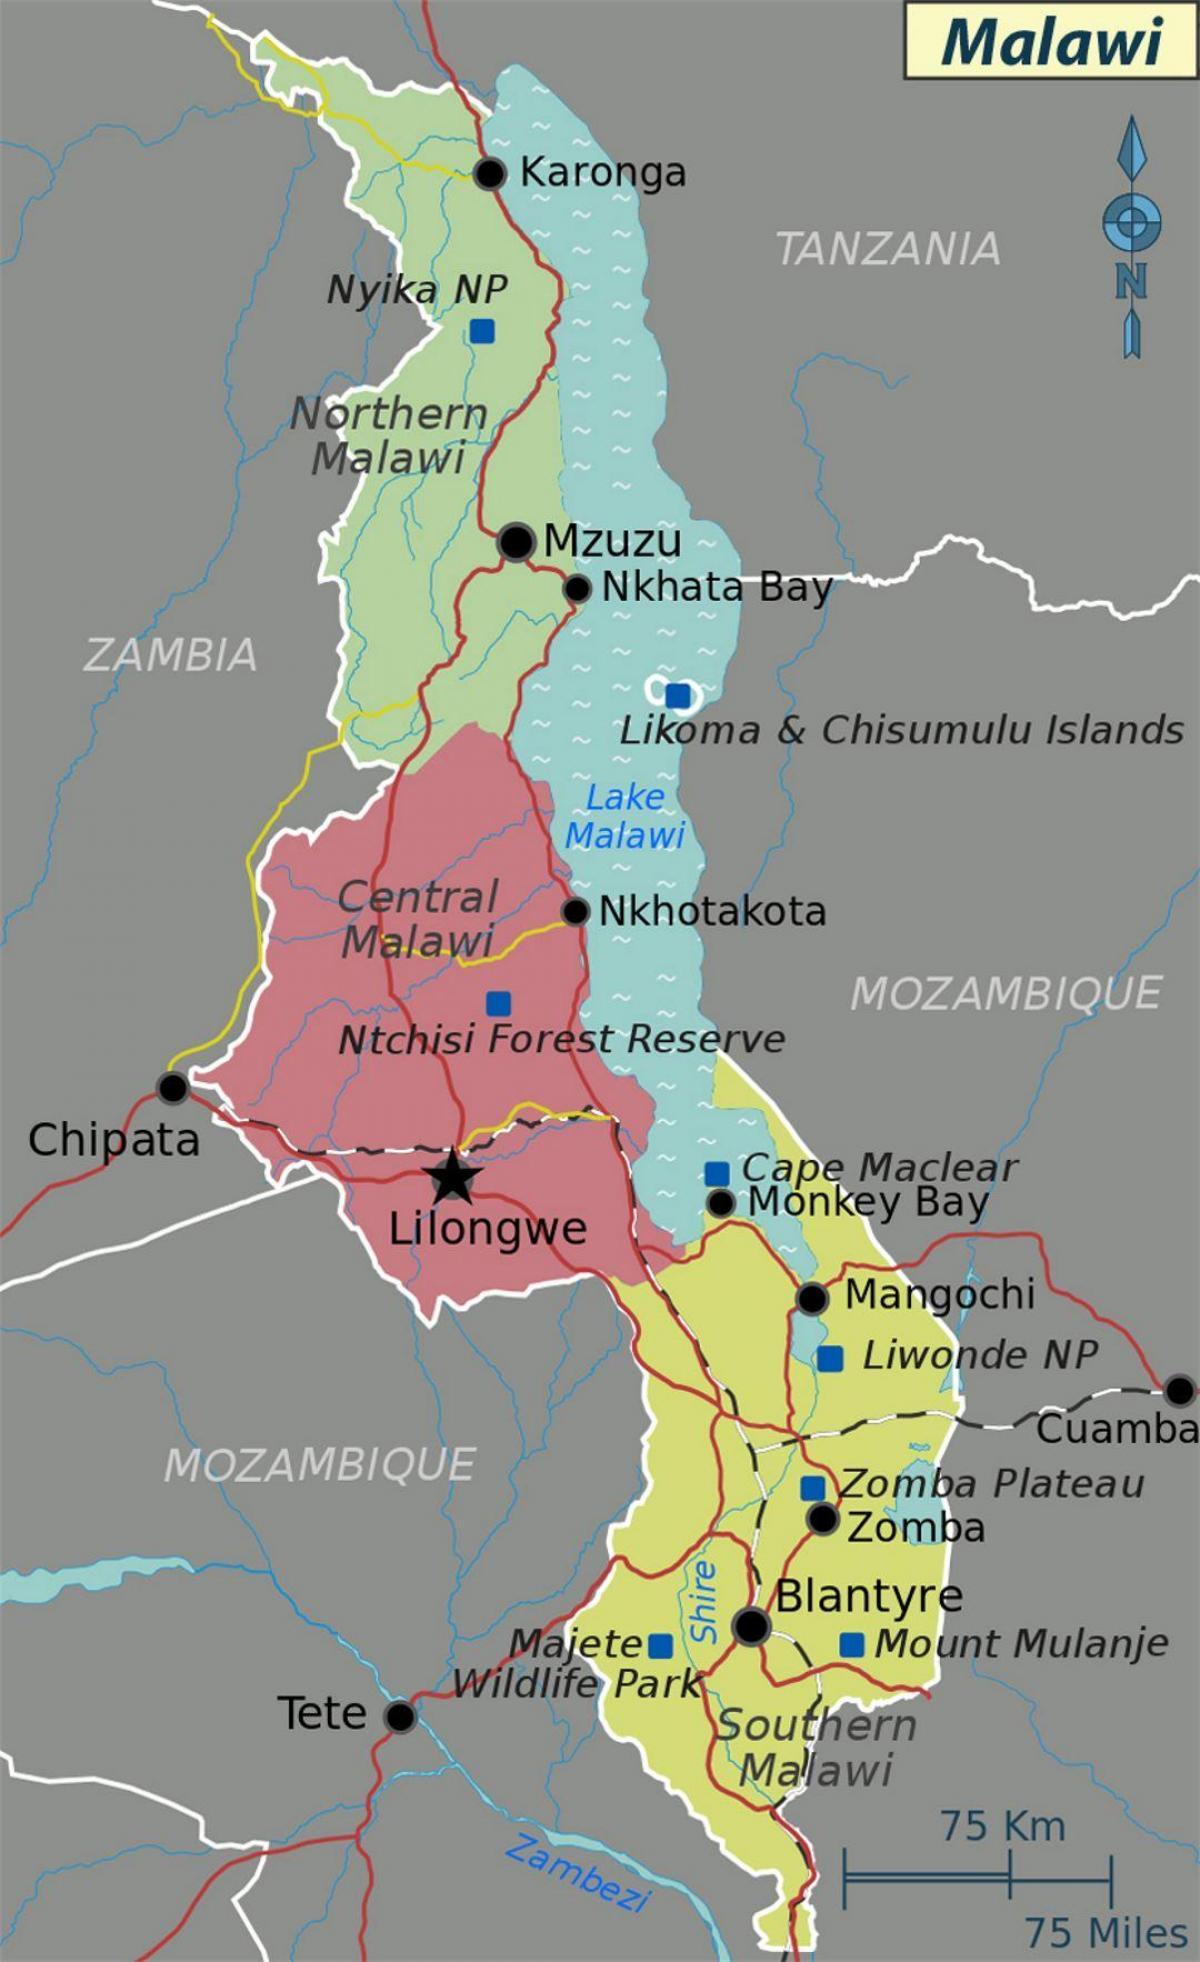 Lake Malawi Africa Map.Lake Malawi Africa Map Map Of Lake Malawi Africa Eastern Africa